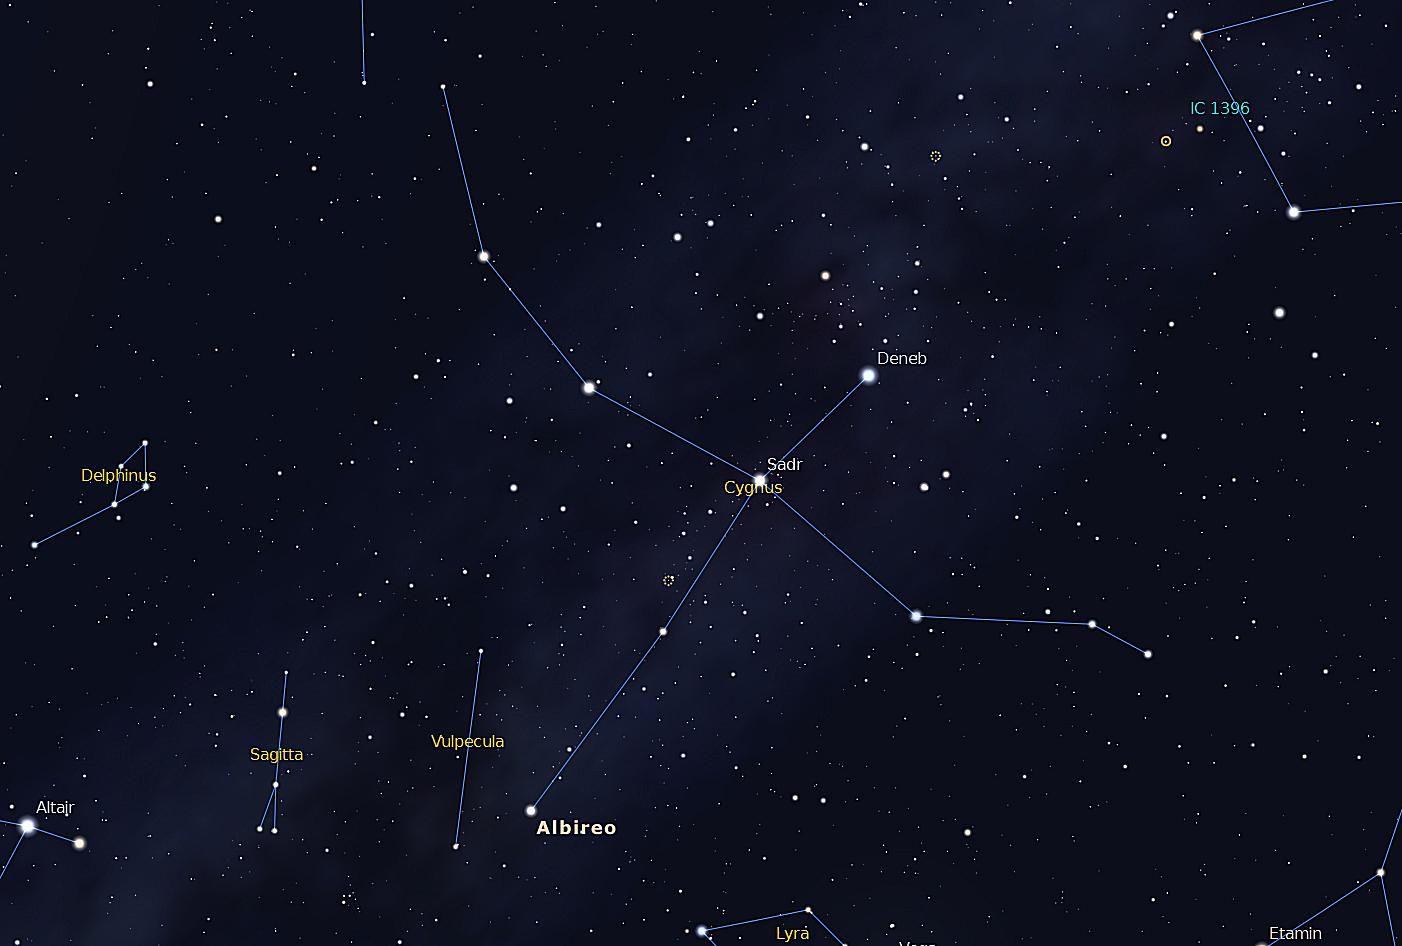 cygnus-and-deneb.jpg